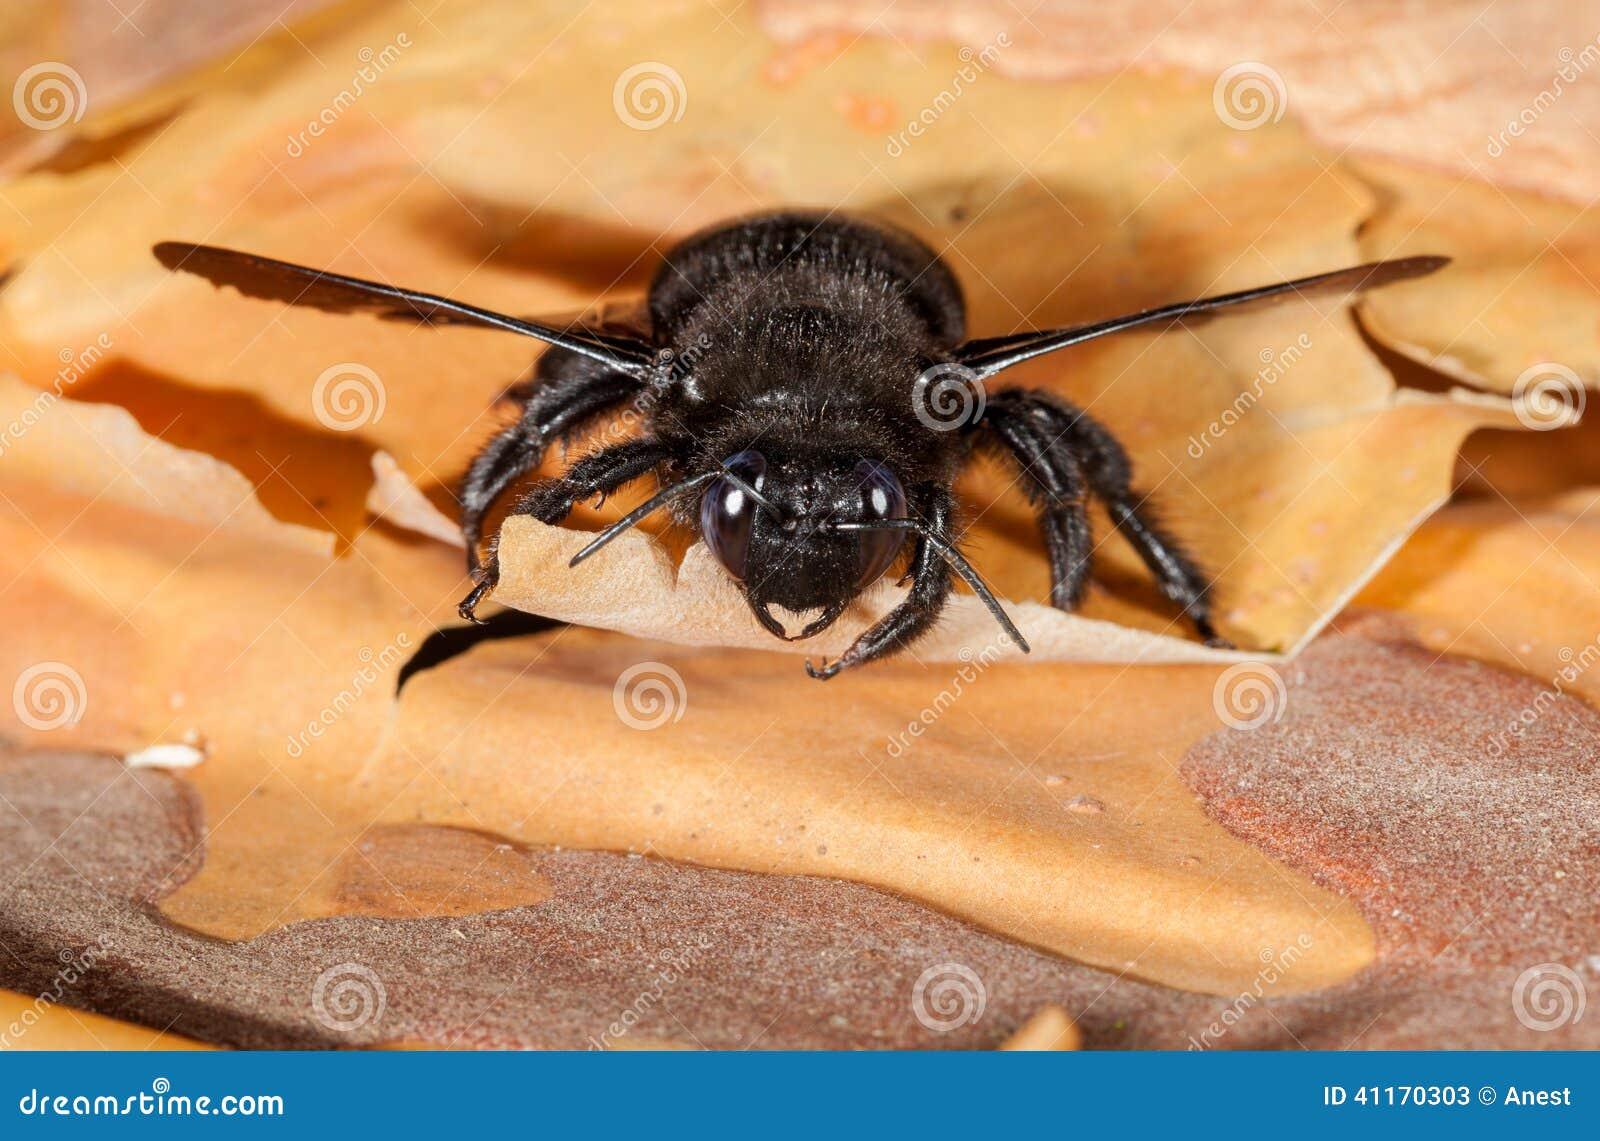 European carpenter bee en face on bark rind